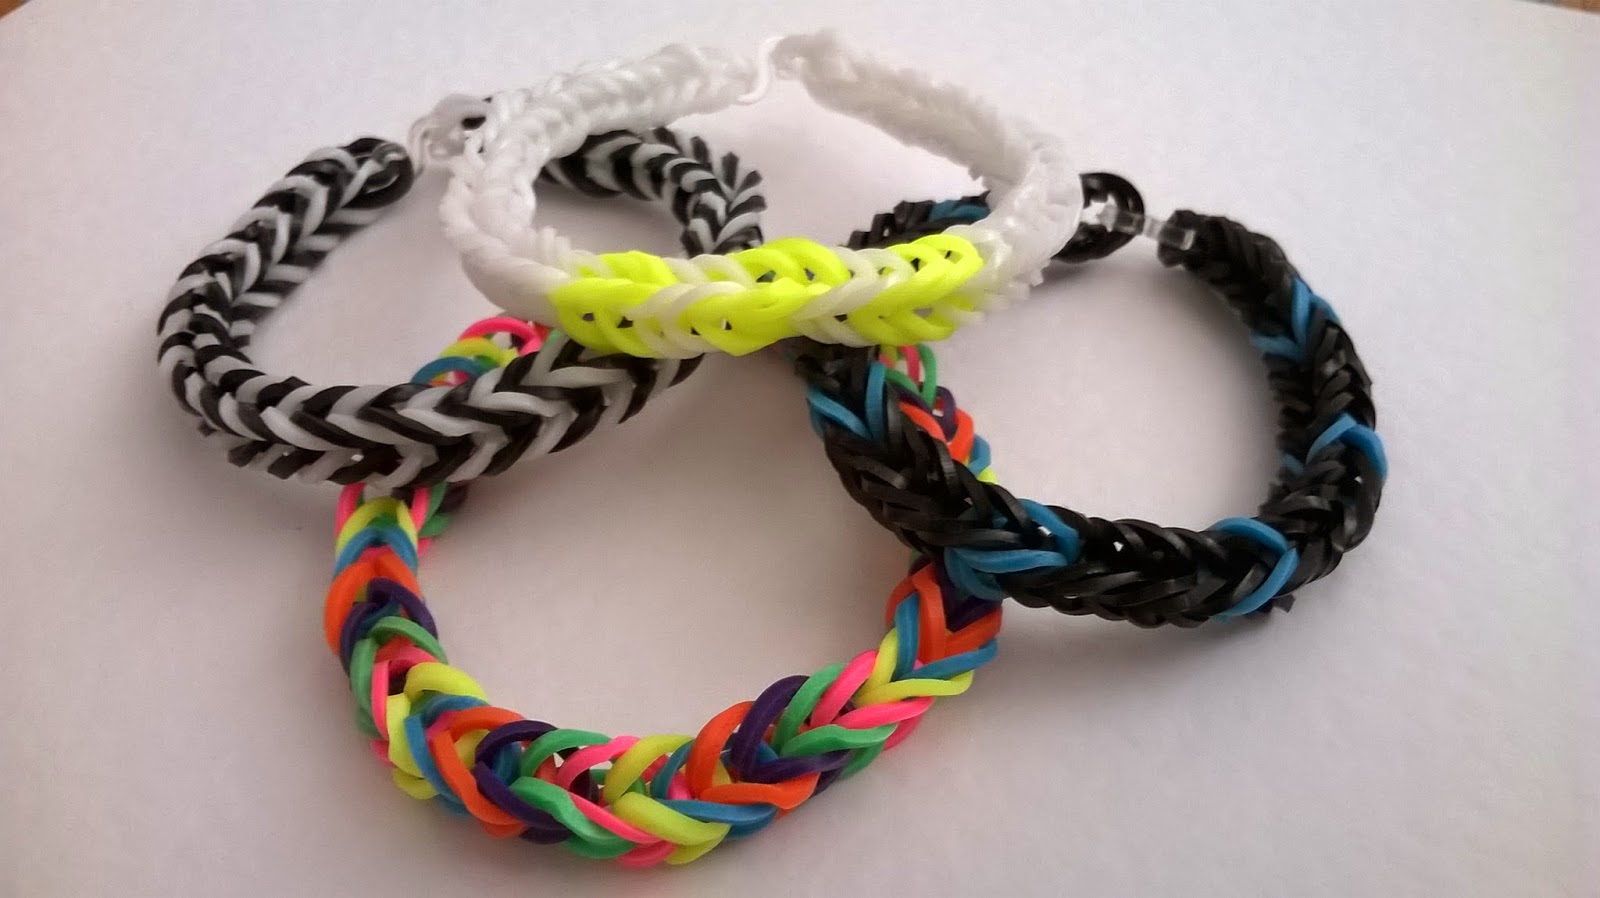 vovs jewellery loom bands tutorial fishtail bracelet